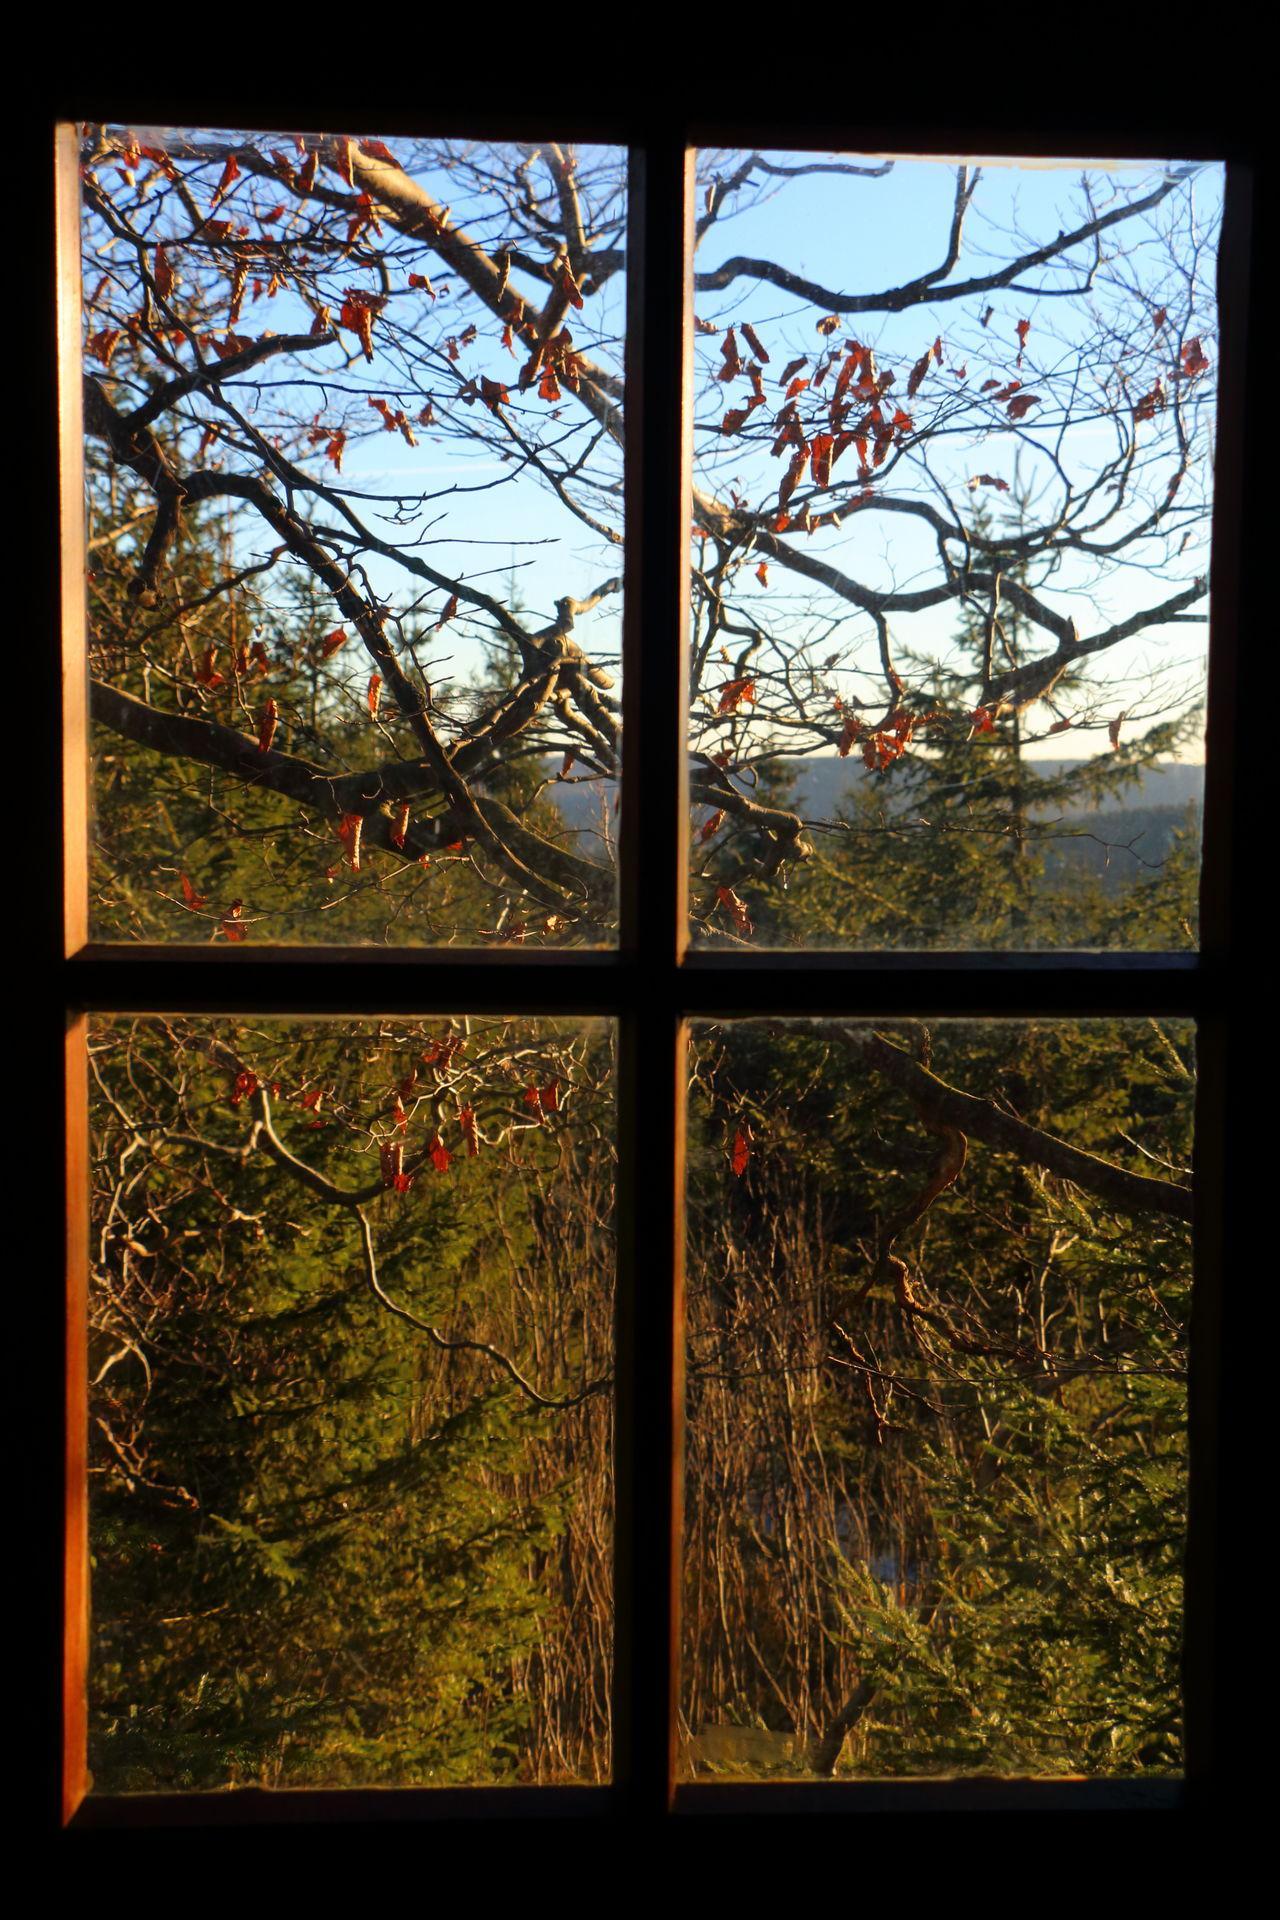 Sonorutica Ausblick Baum Blick Aus Dem Fenster Dark Dunkel Fenster Himmel Licht Light Natur Nature Sky Tree View View Out My Window Window